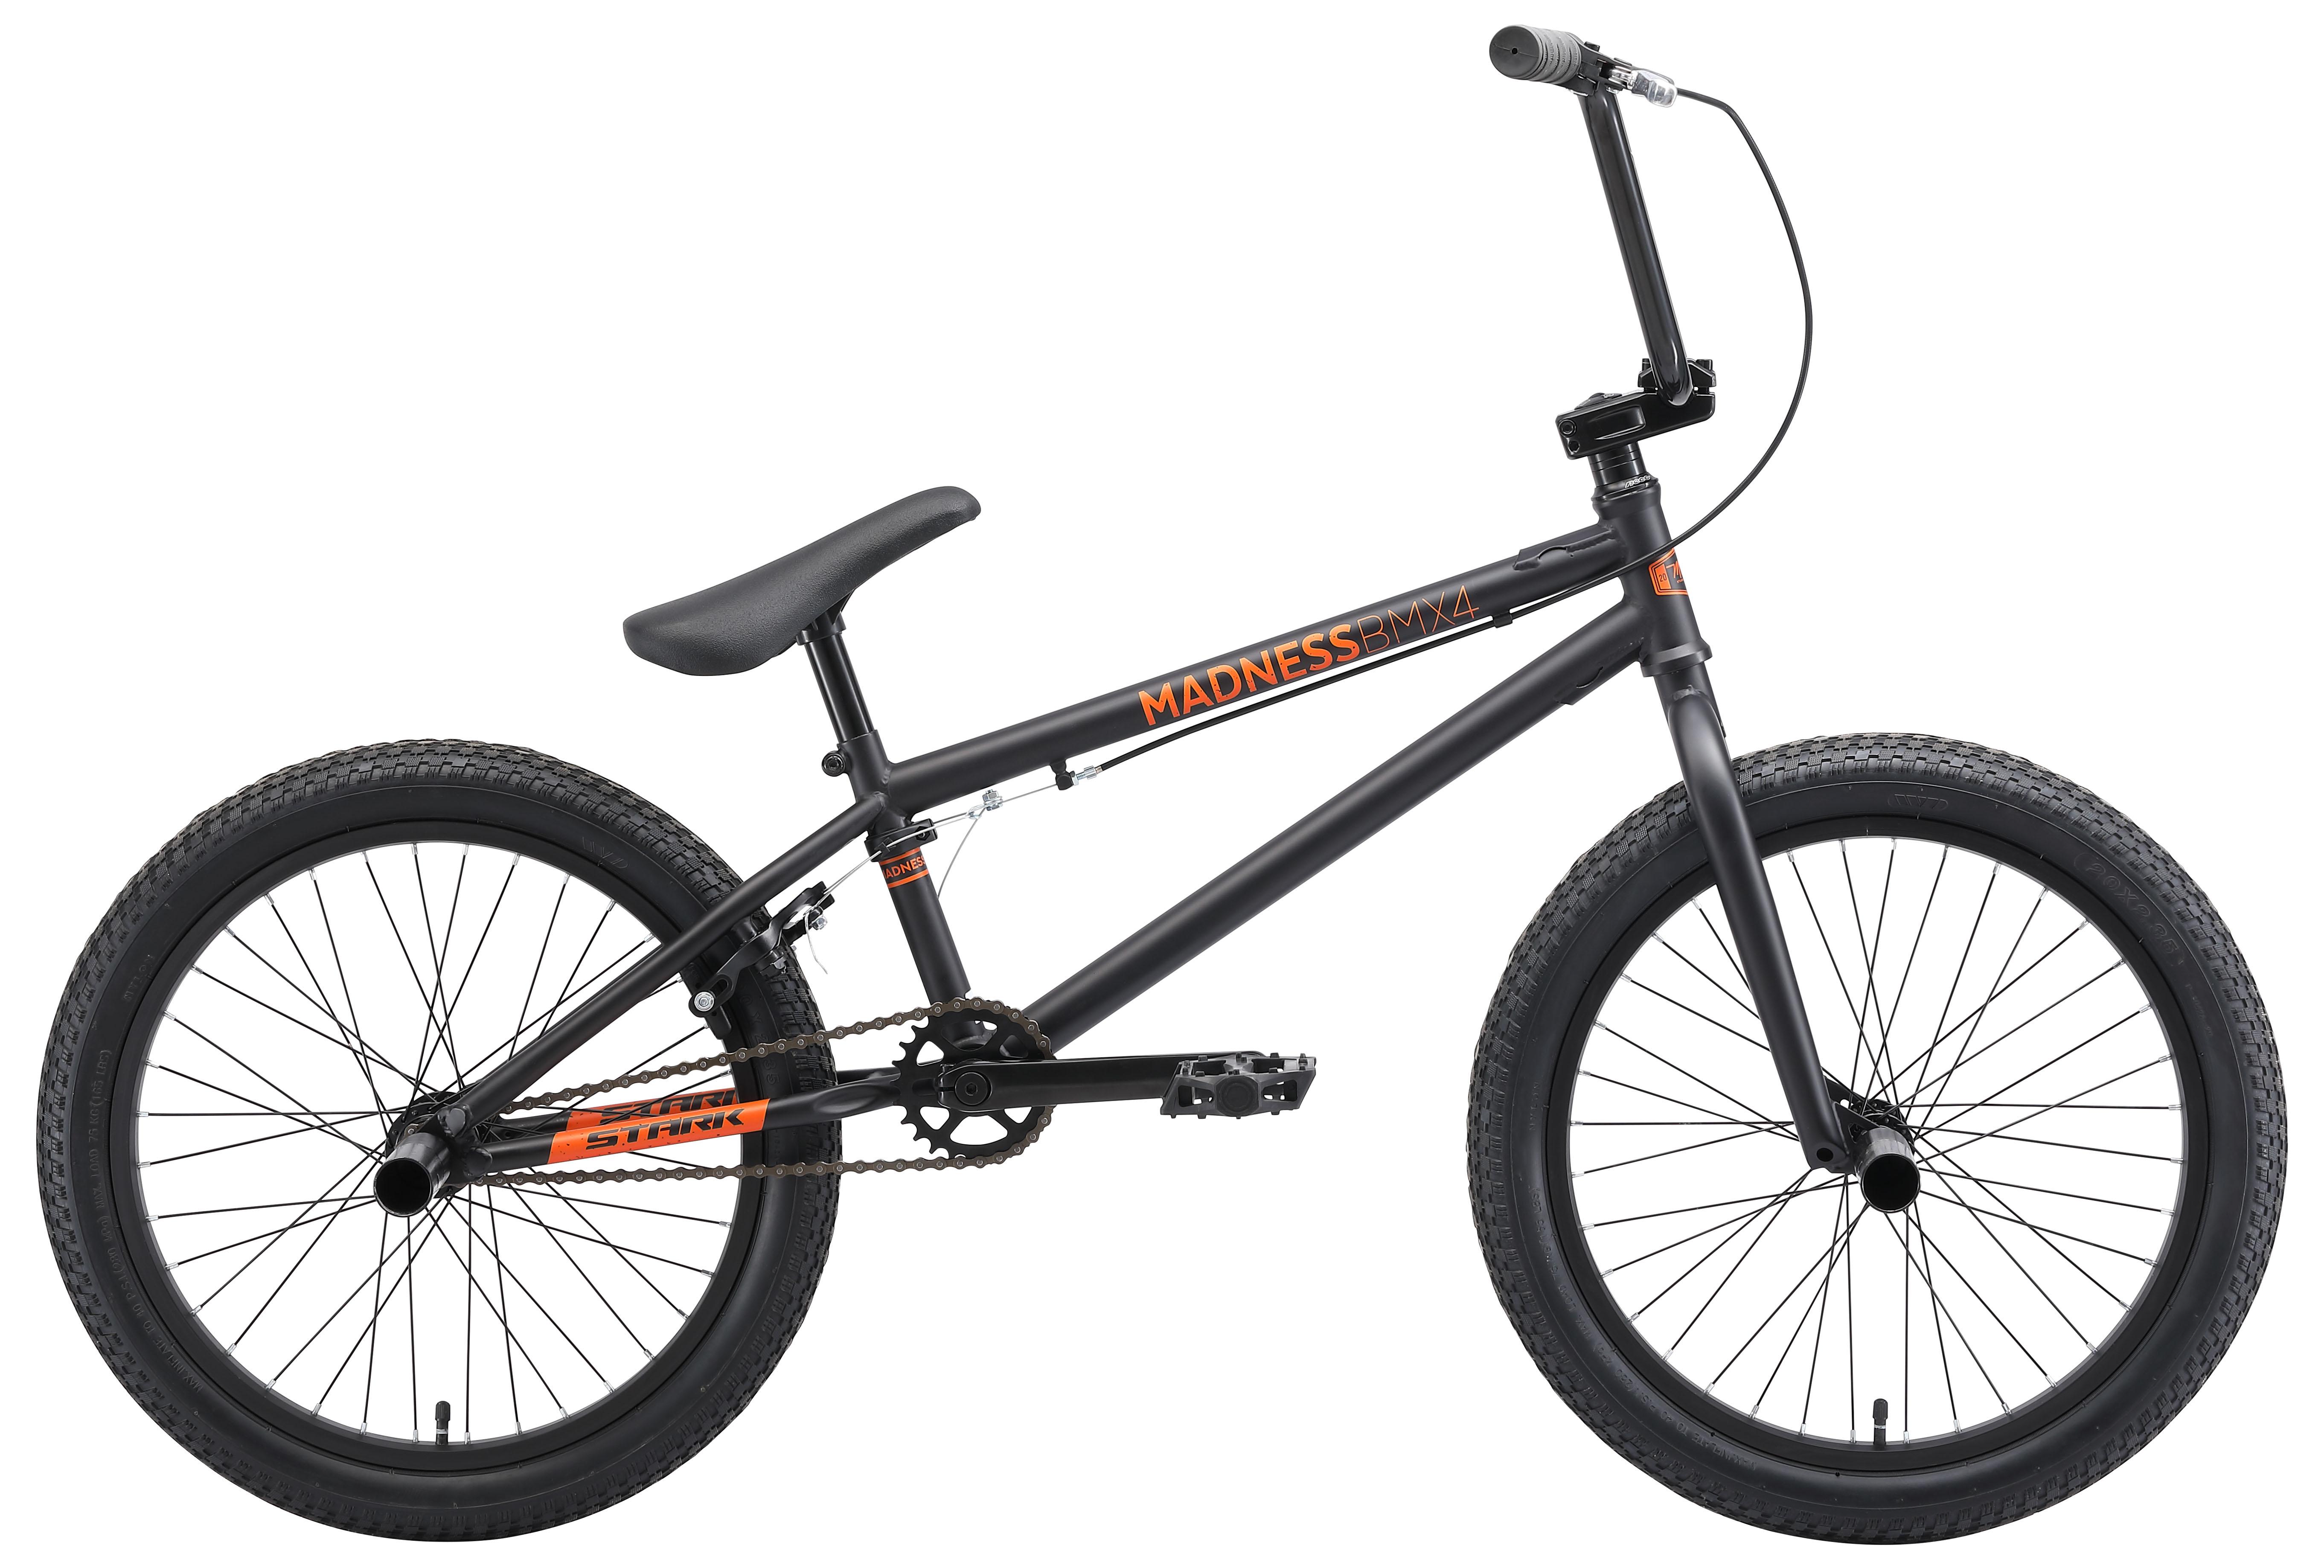 купить Велосипед Stark Madness BMX 4 2019 онлайн